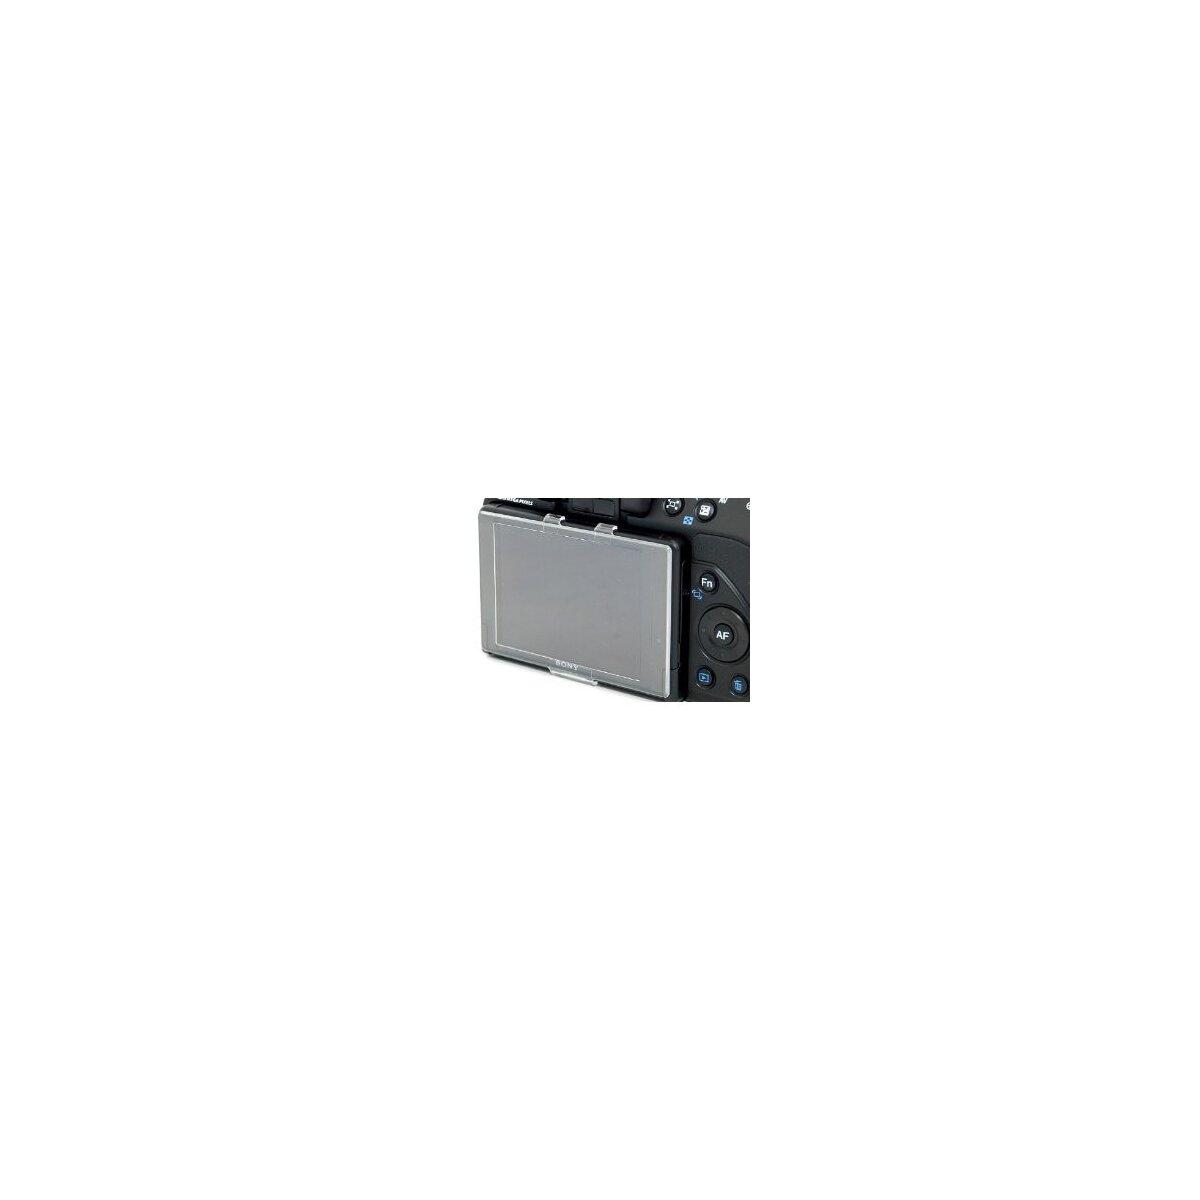 Displayschutz kompatibel mit Sony A500, A550, A580 - LCD ** Monitorschutz - Schutzabdeckung- Cover- Bildschirmschutz-Monitorschutzkappe